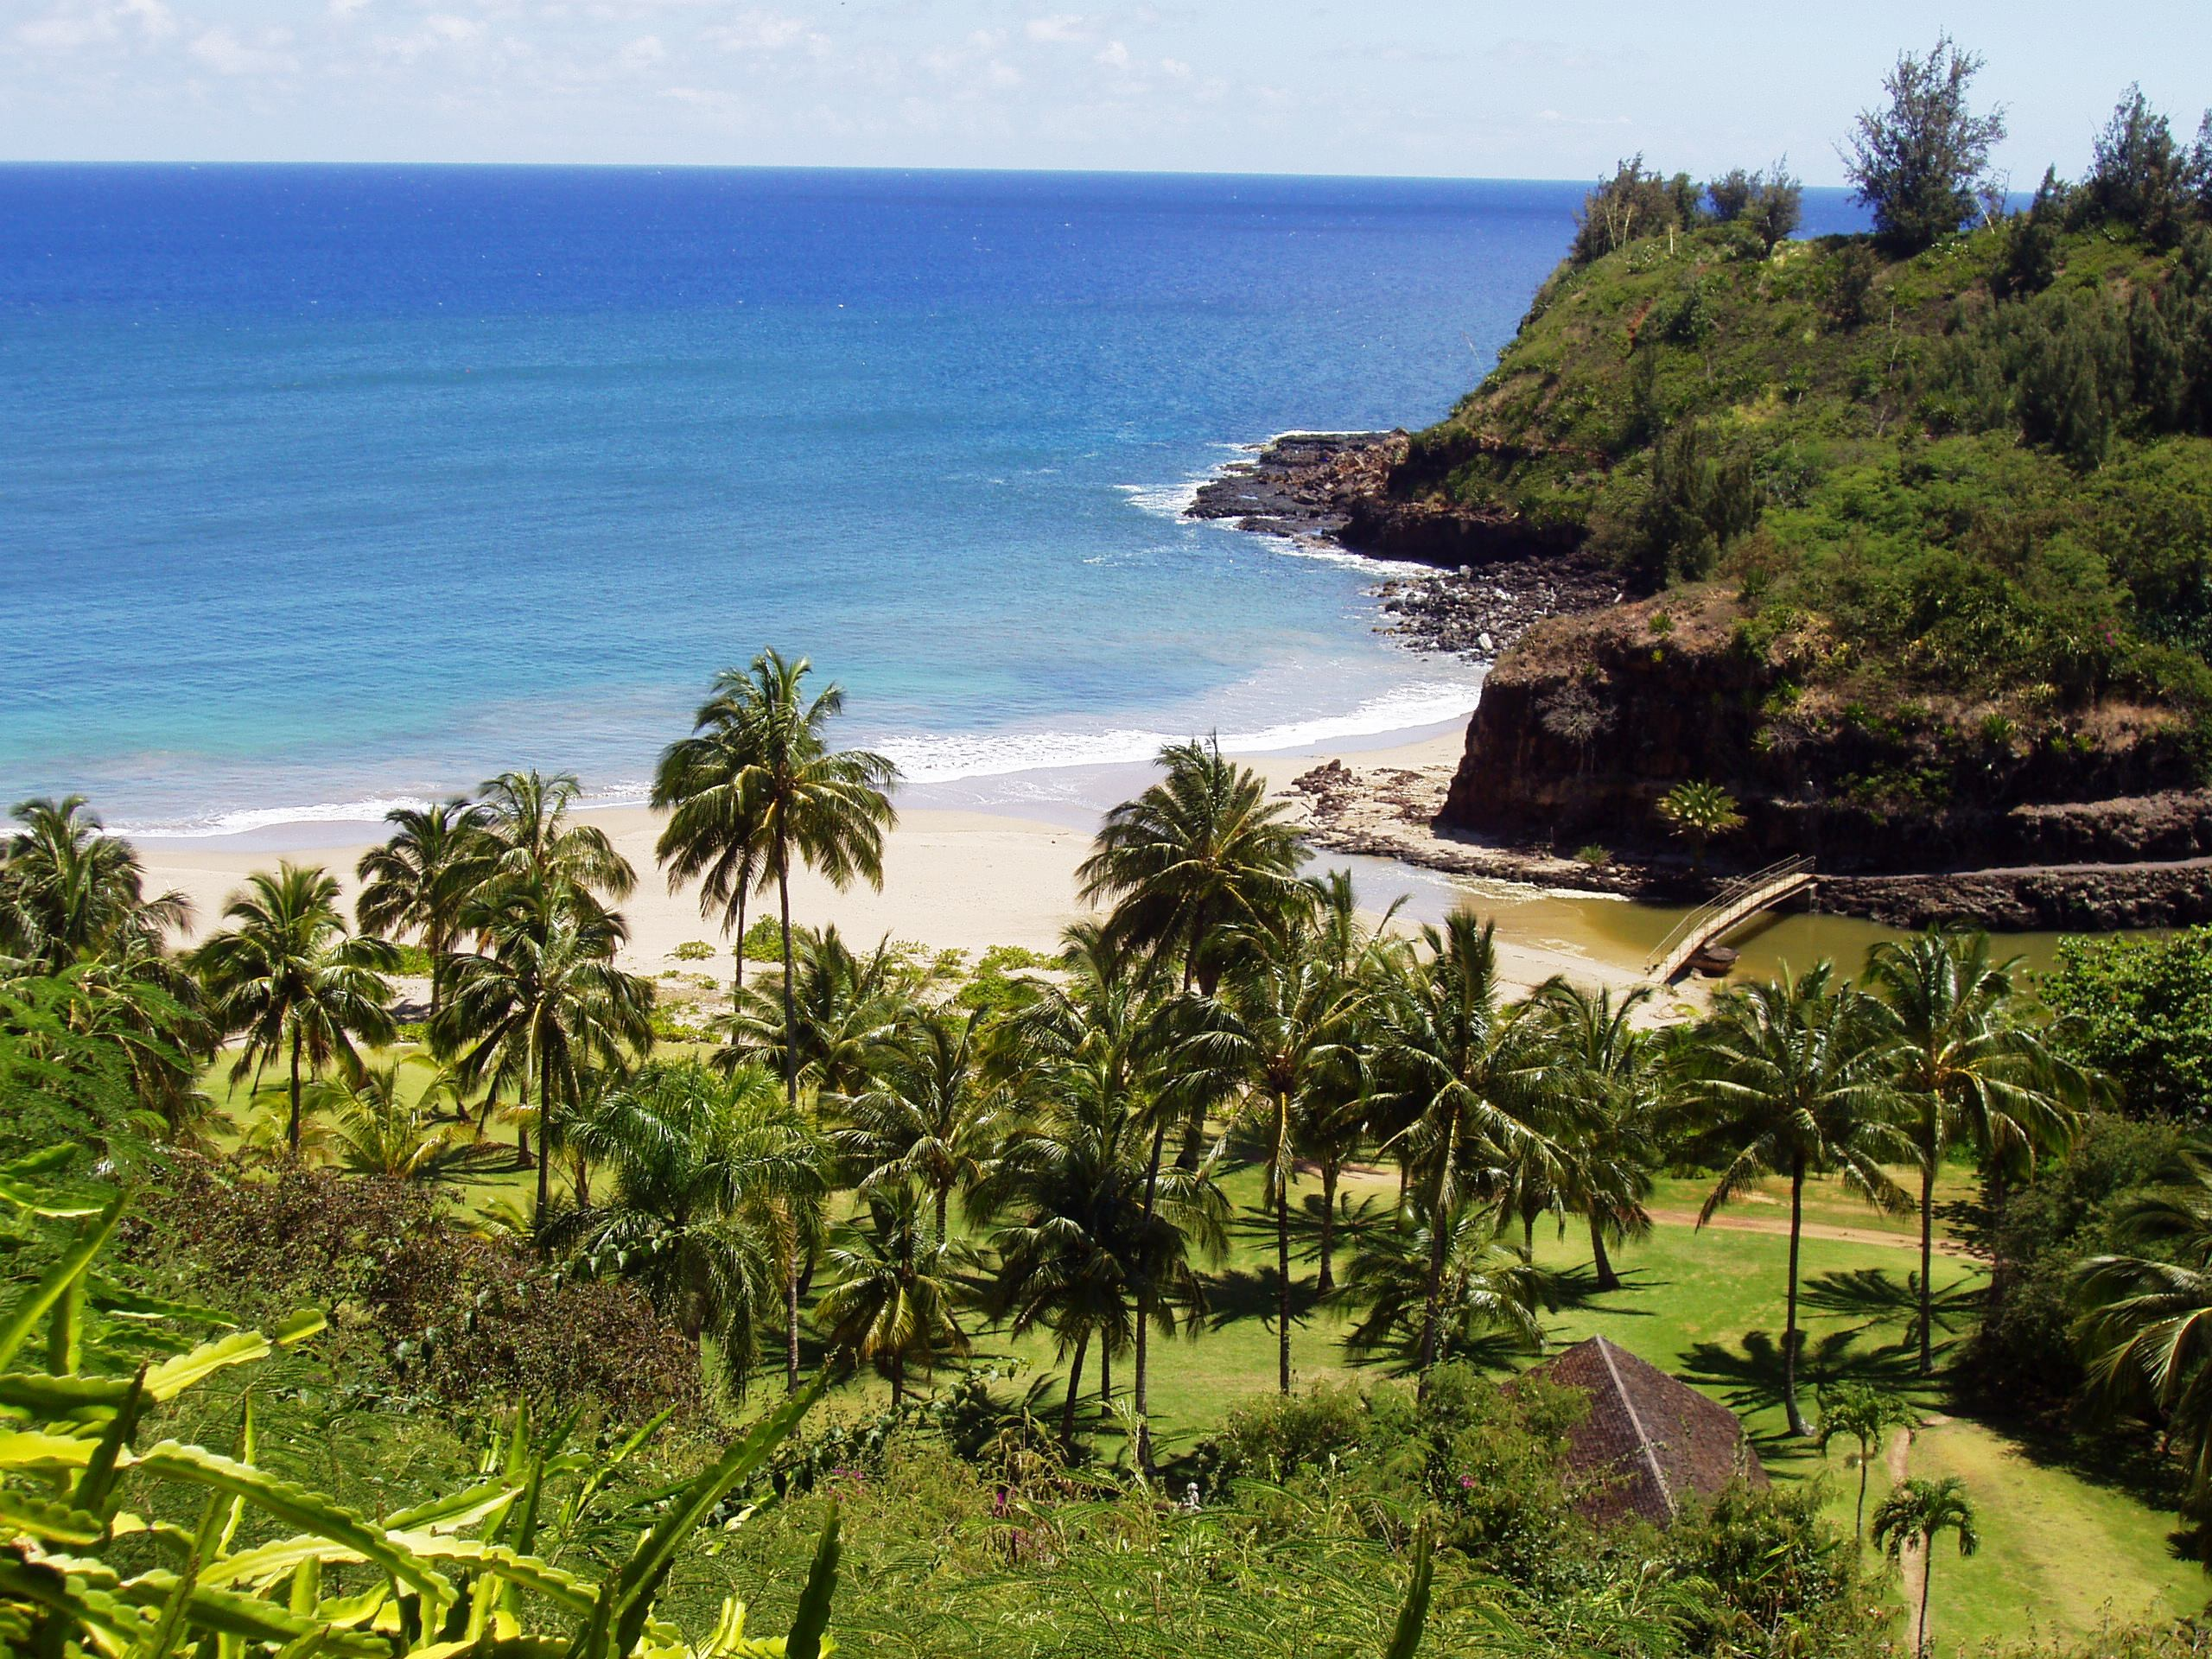 What Hawaiian Island Is The New Disney Resort On